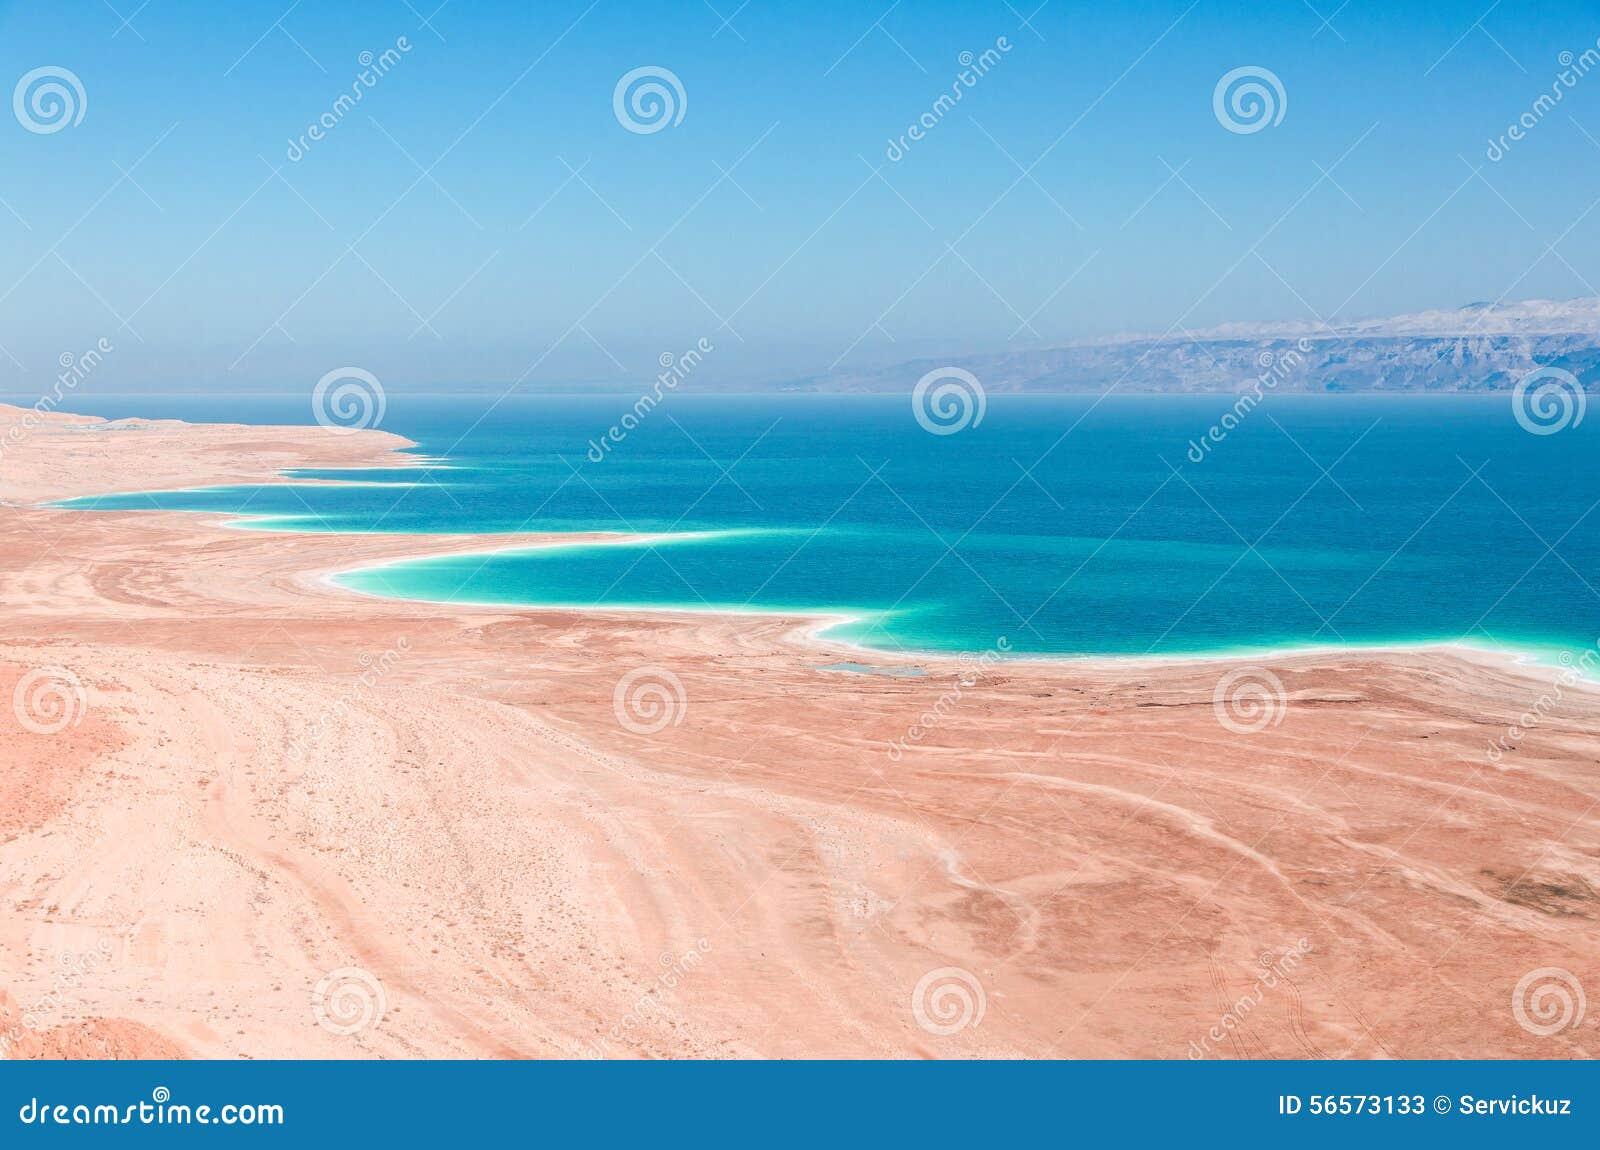 Download Νεκρή ακτή θάλασσας στο ακατοίκητο εξωγήινο τοπίο ερήμων Στοκ Εικόνα - εικόνα από παλαιστίνη, εγκαταλειμμένος: 56573133